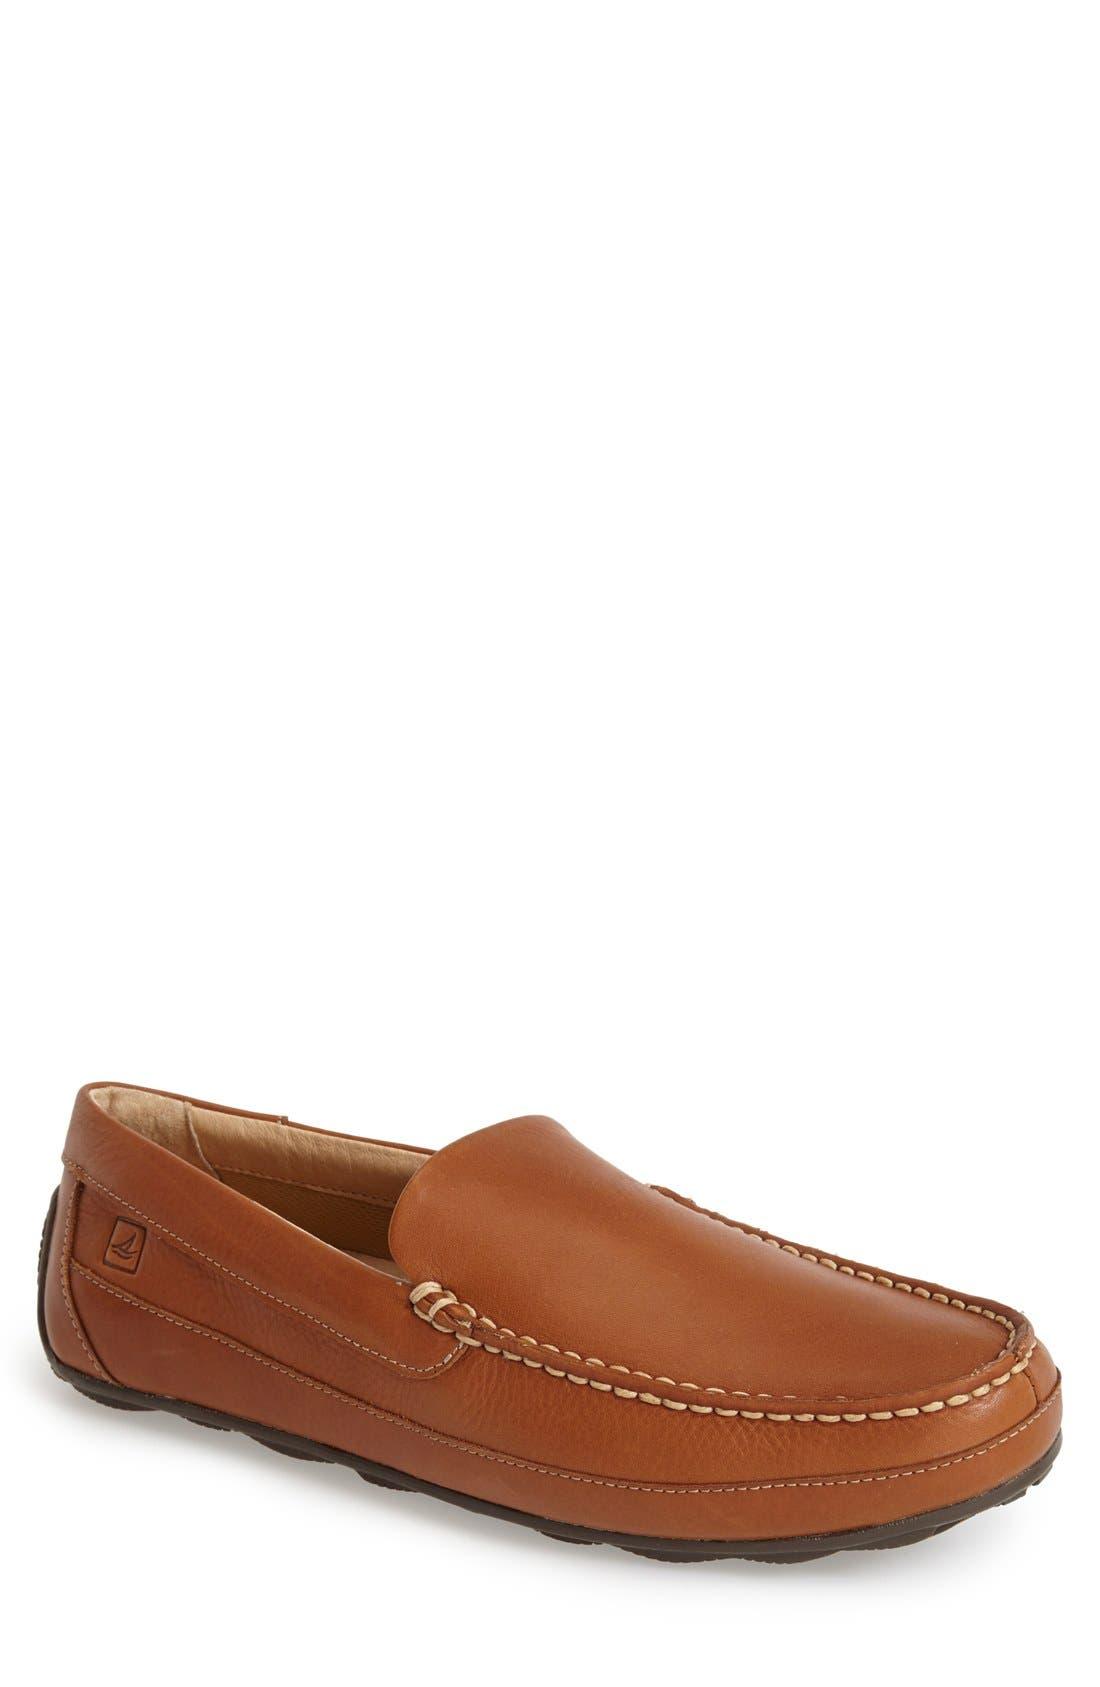 SPERRY 'Hampden' Driving Shoe, Main, color, 200